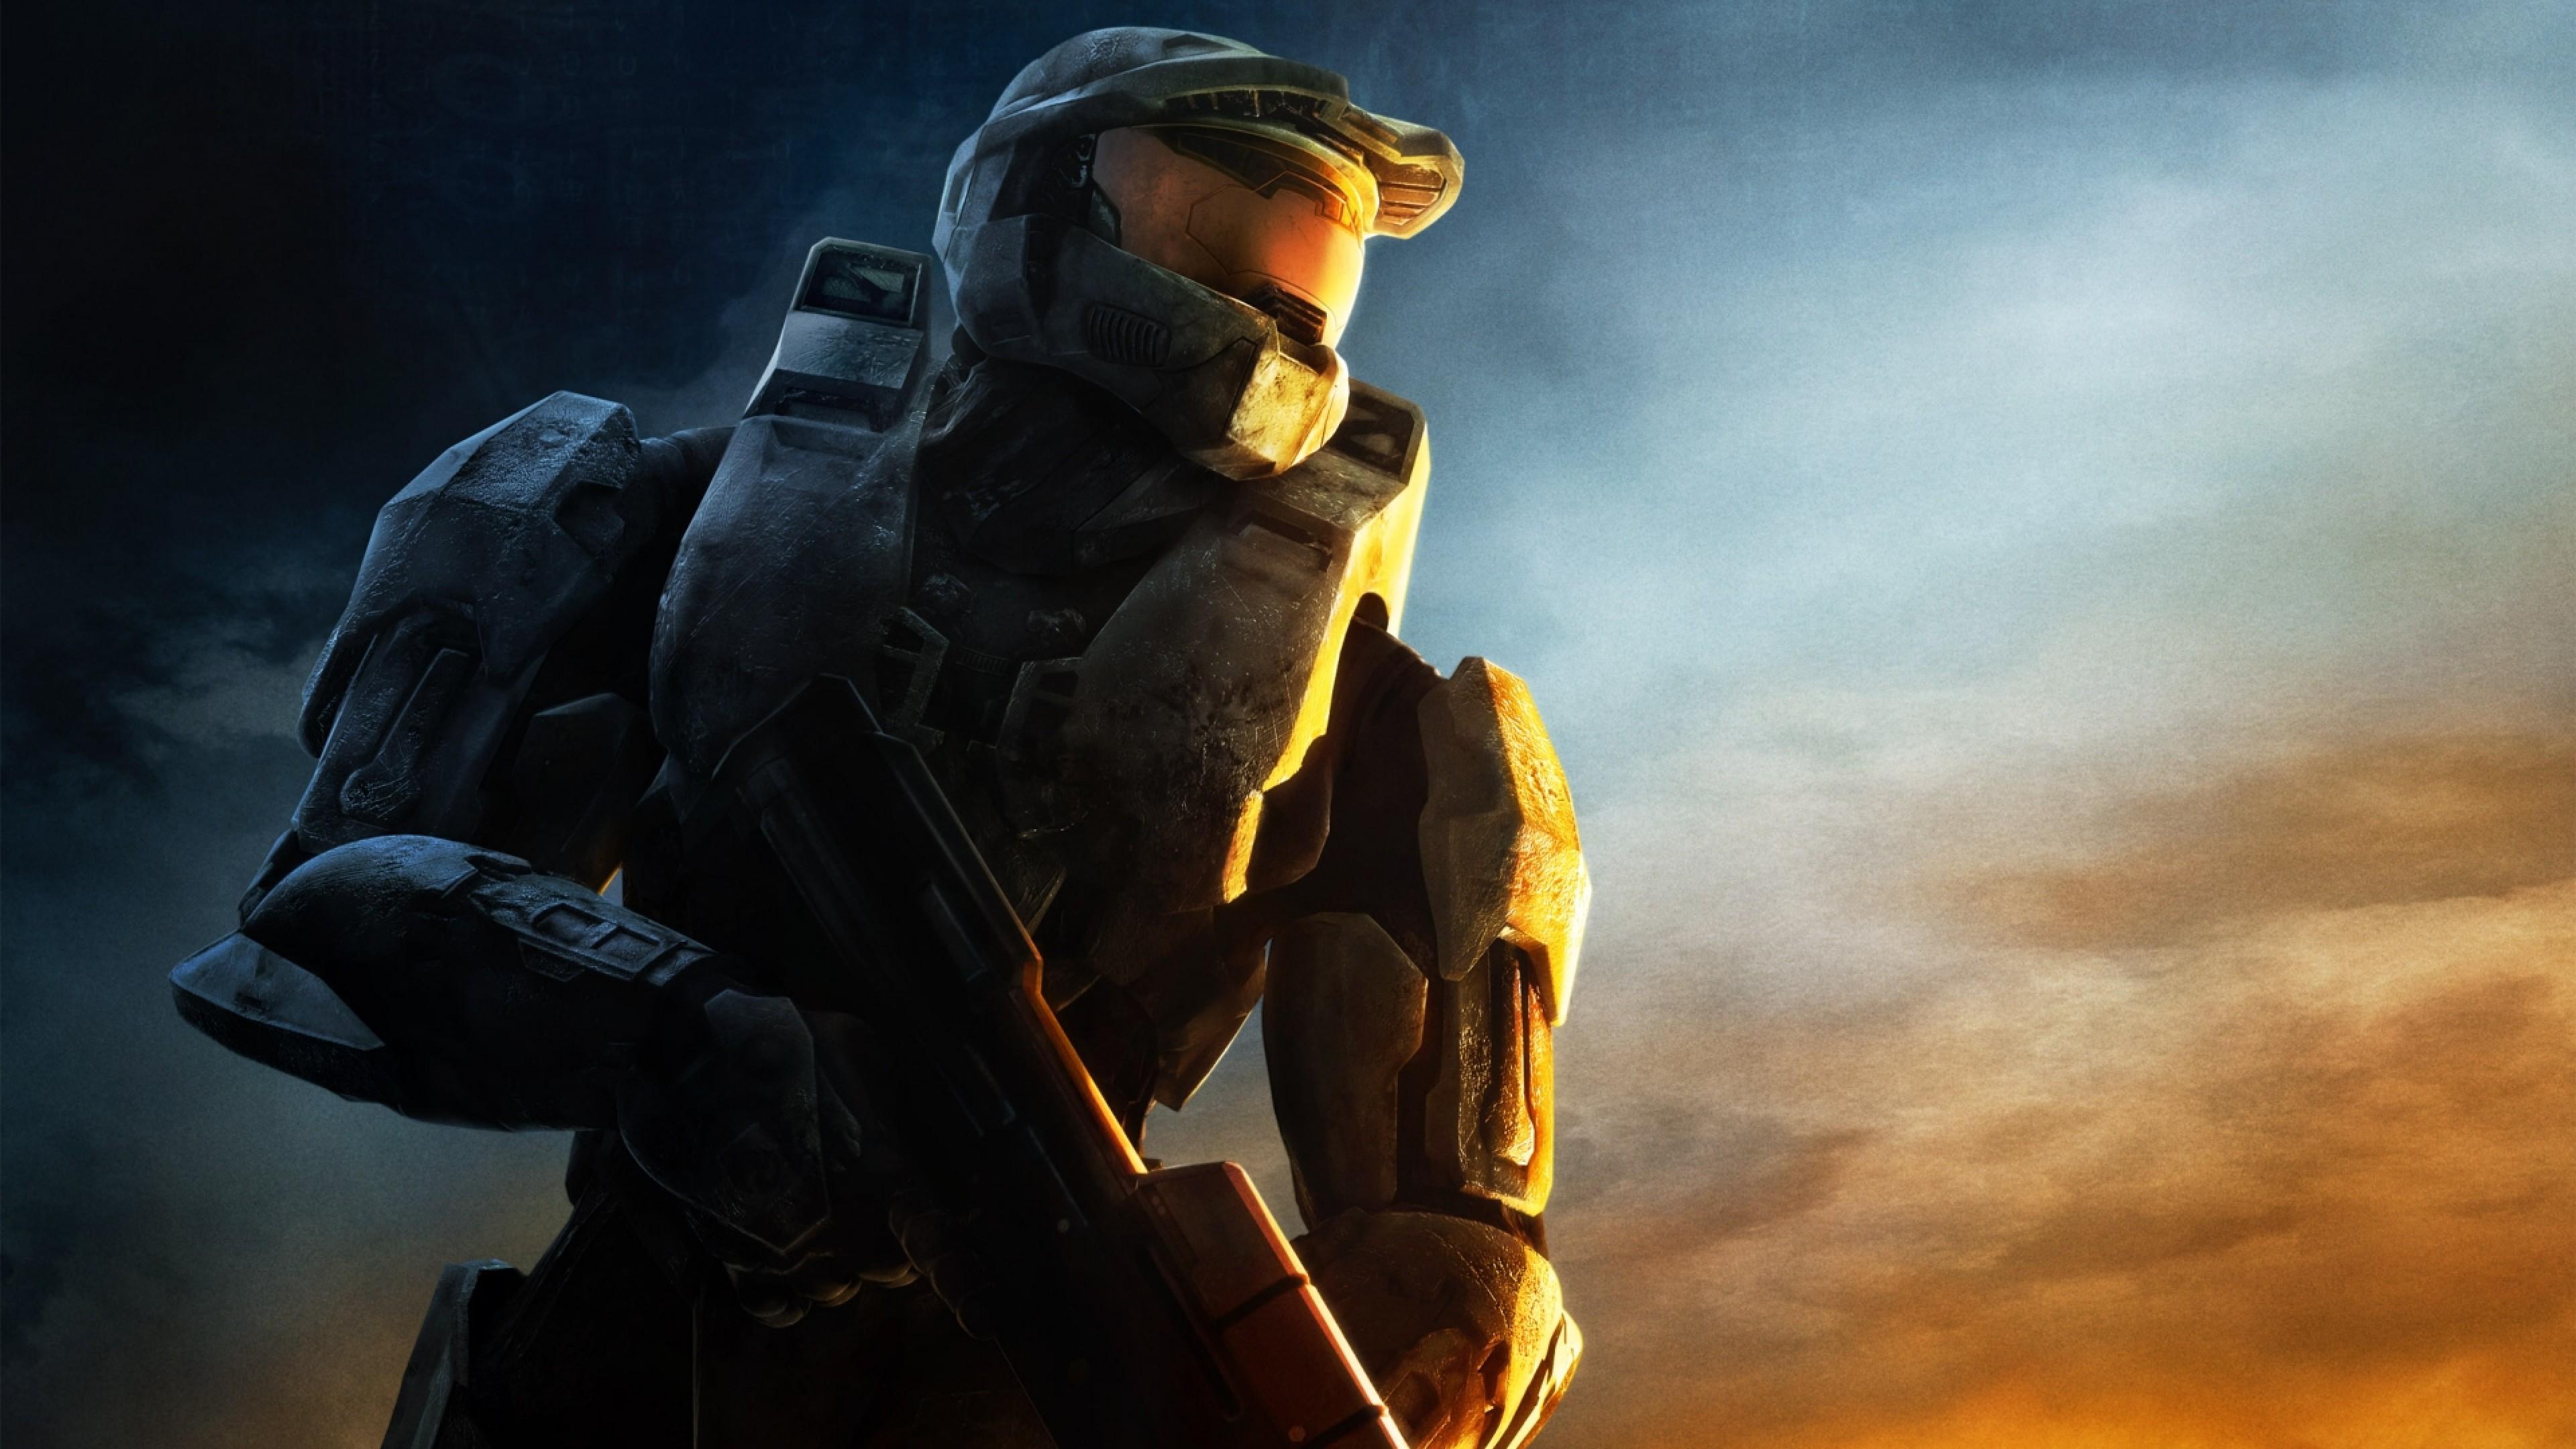 … Background 4K Ultra HD. Wallpaper halo, soldier, sunset, gun